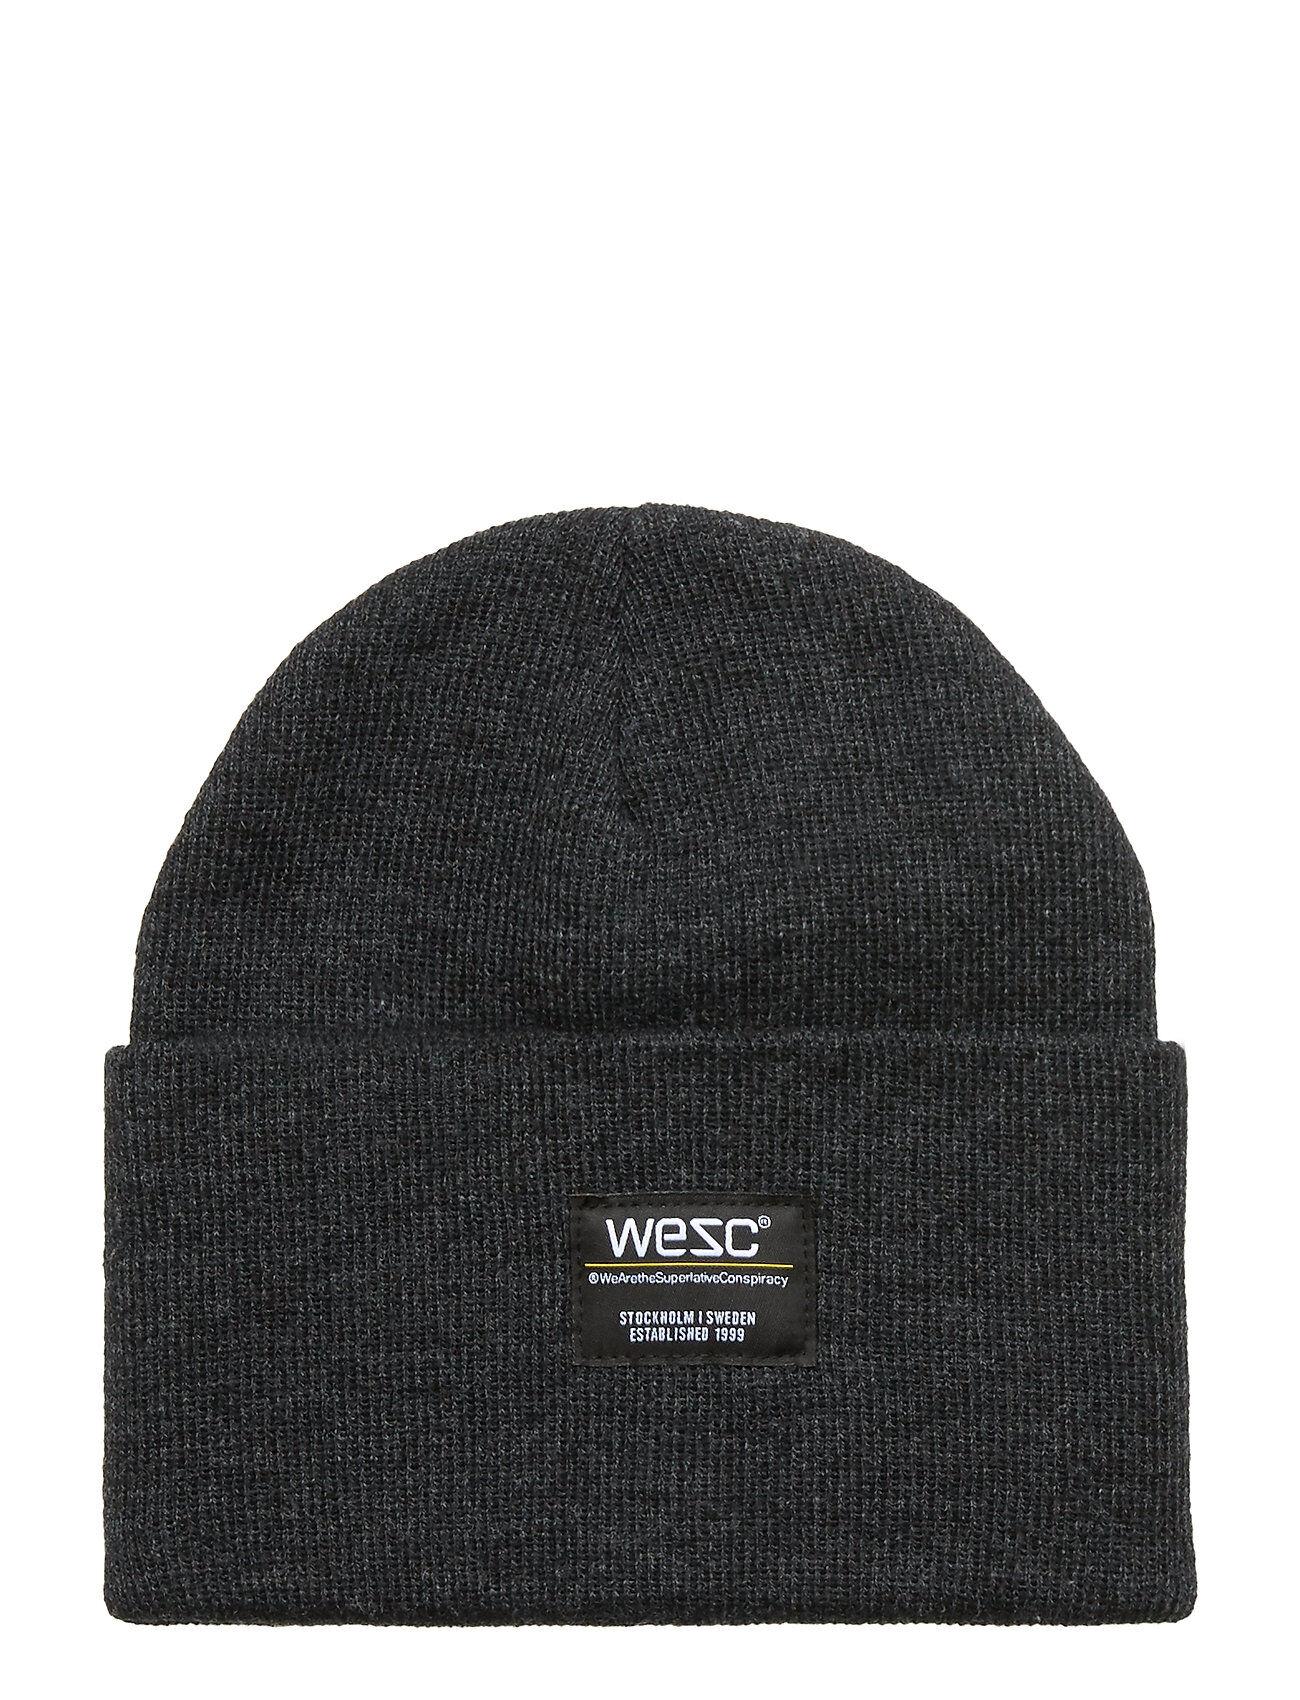 WeSC Puncho Beanie Accessories Headwear Beanies Harmaa WeSC